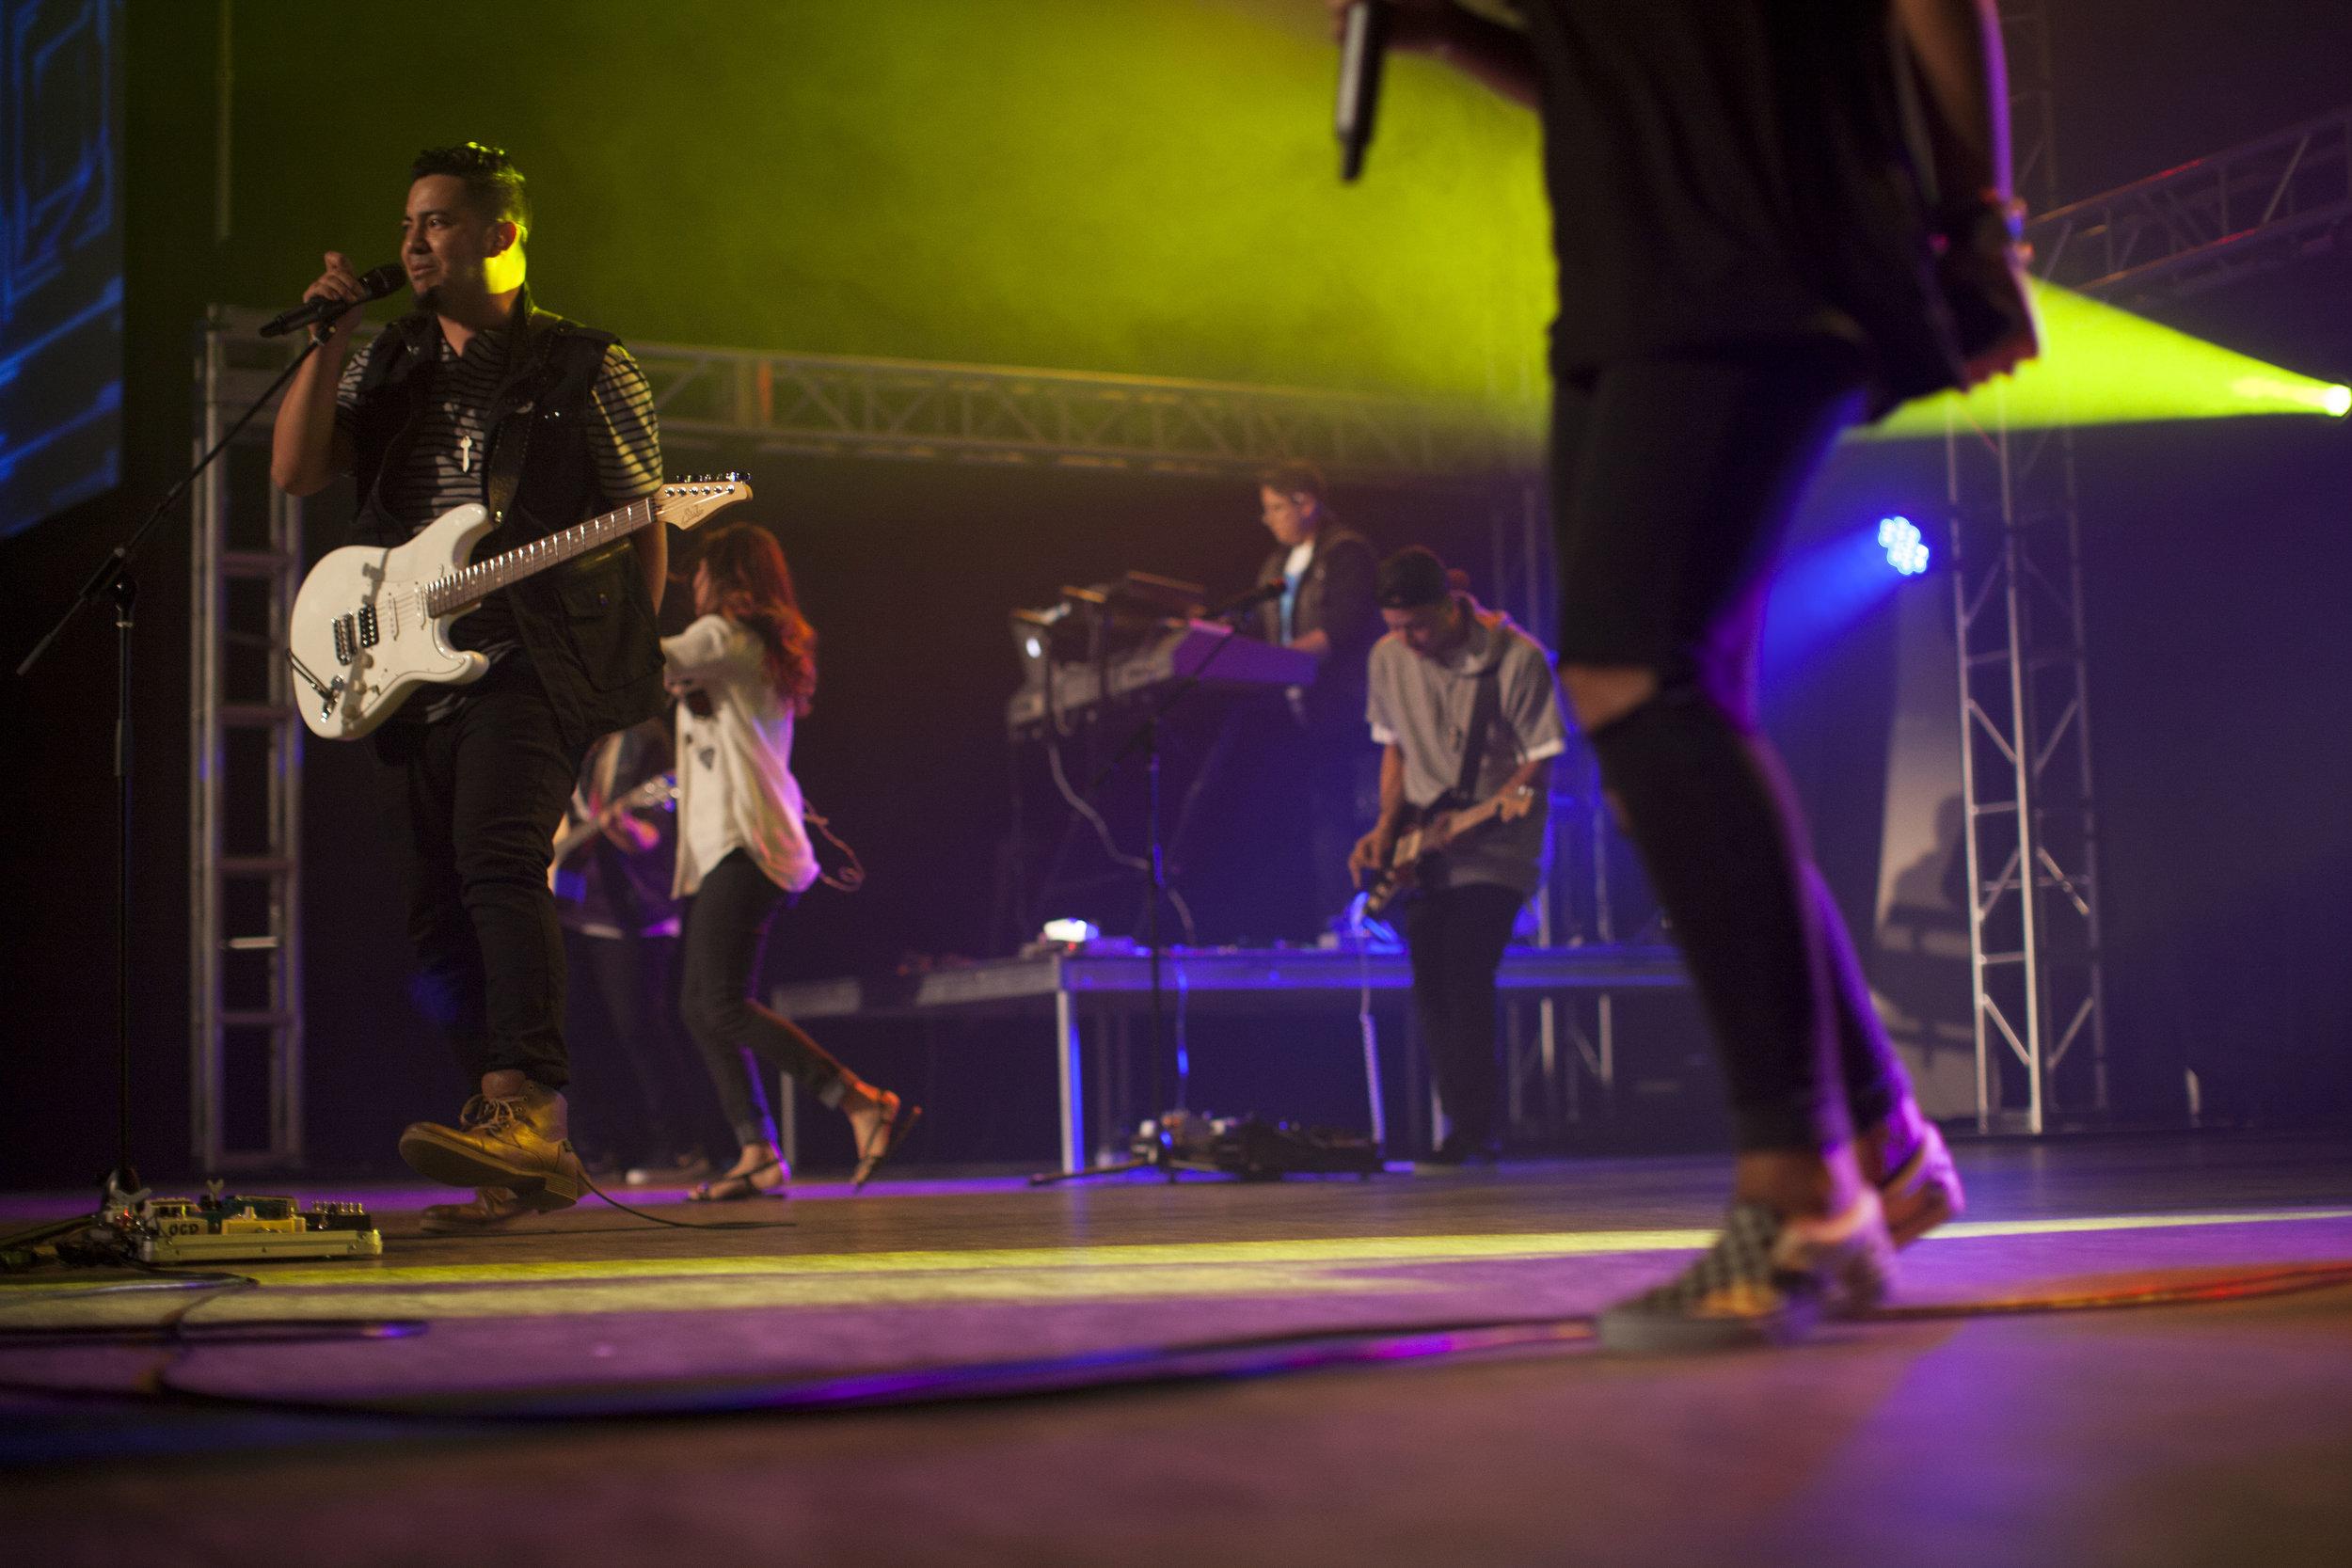 concert_5.JPG